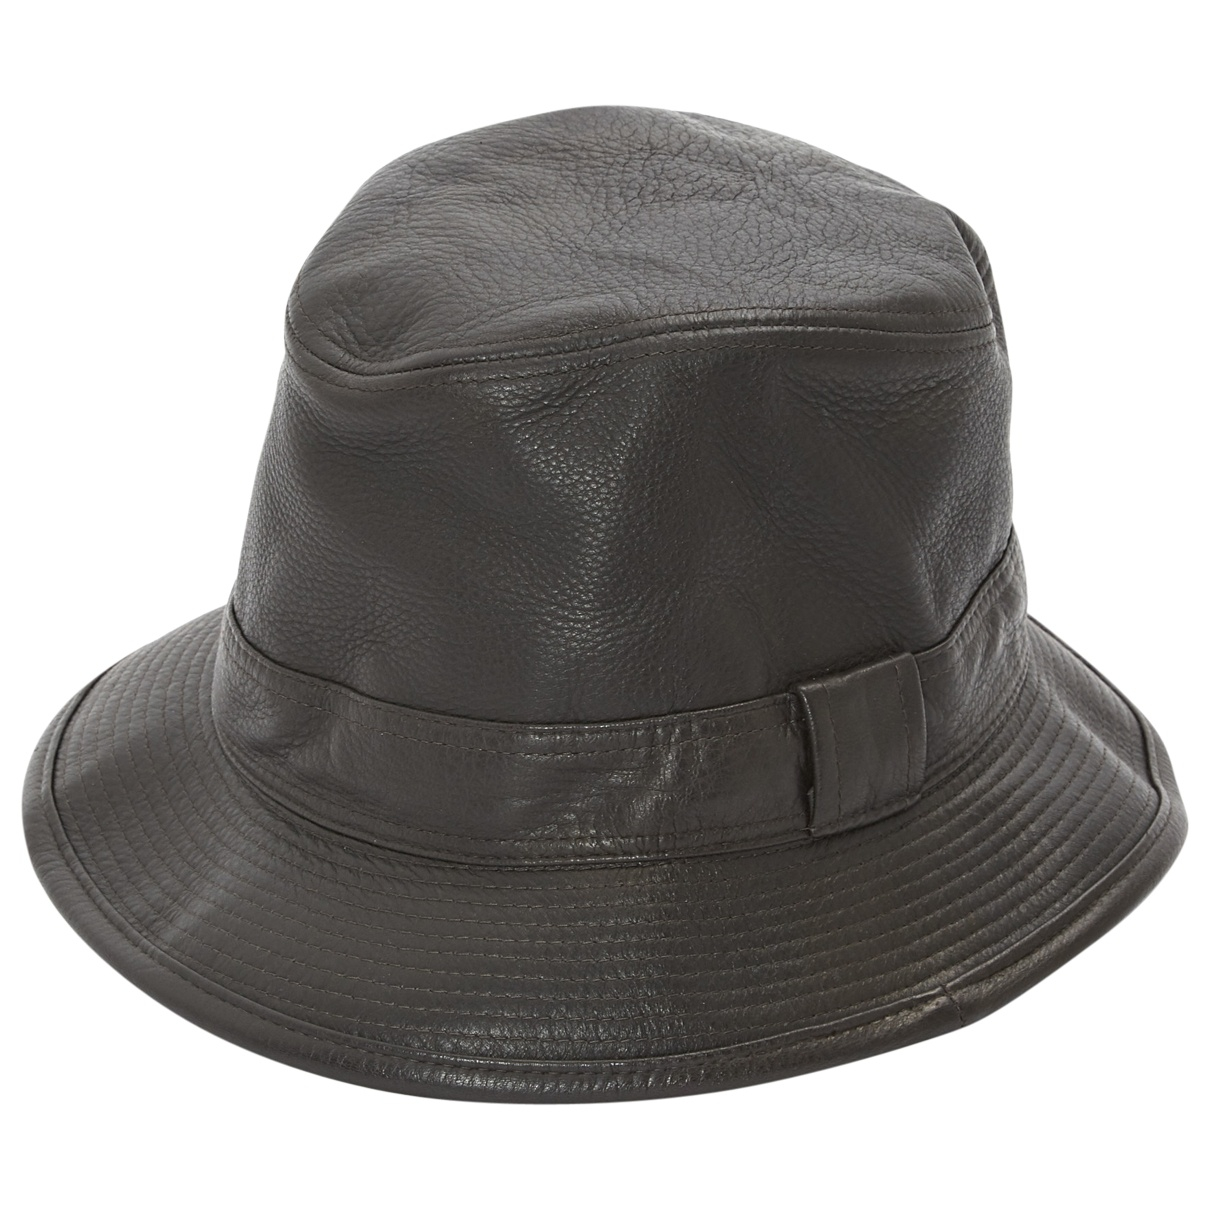 Hermès \N Brown Leather hat & pull on hat for Men 58 cm